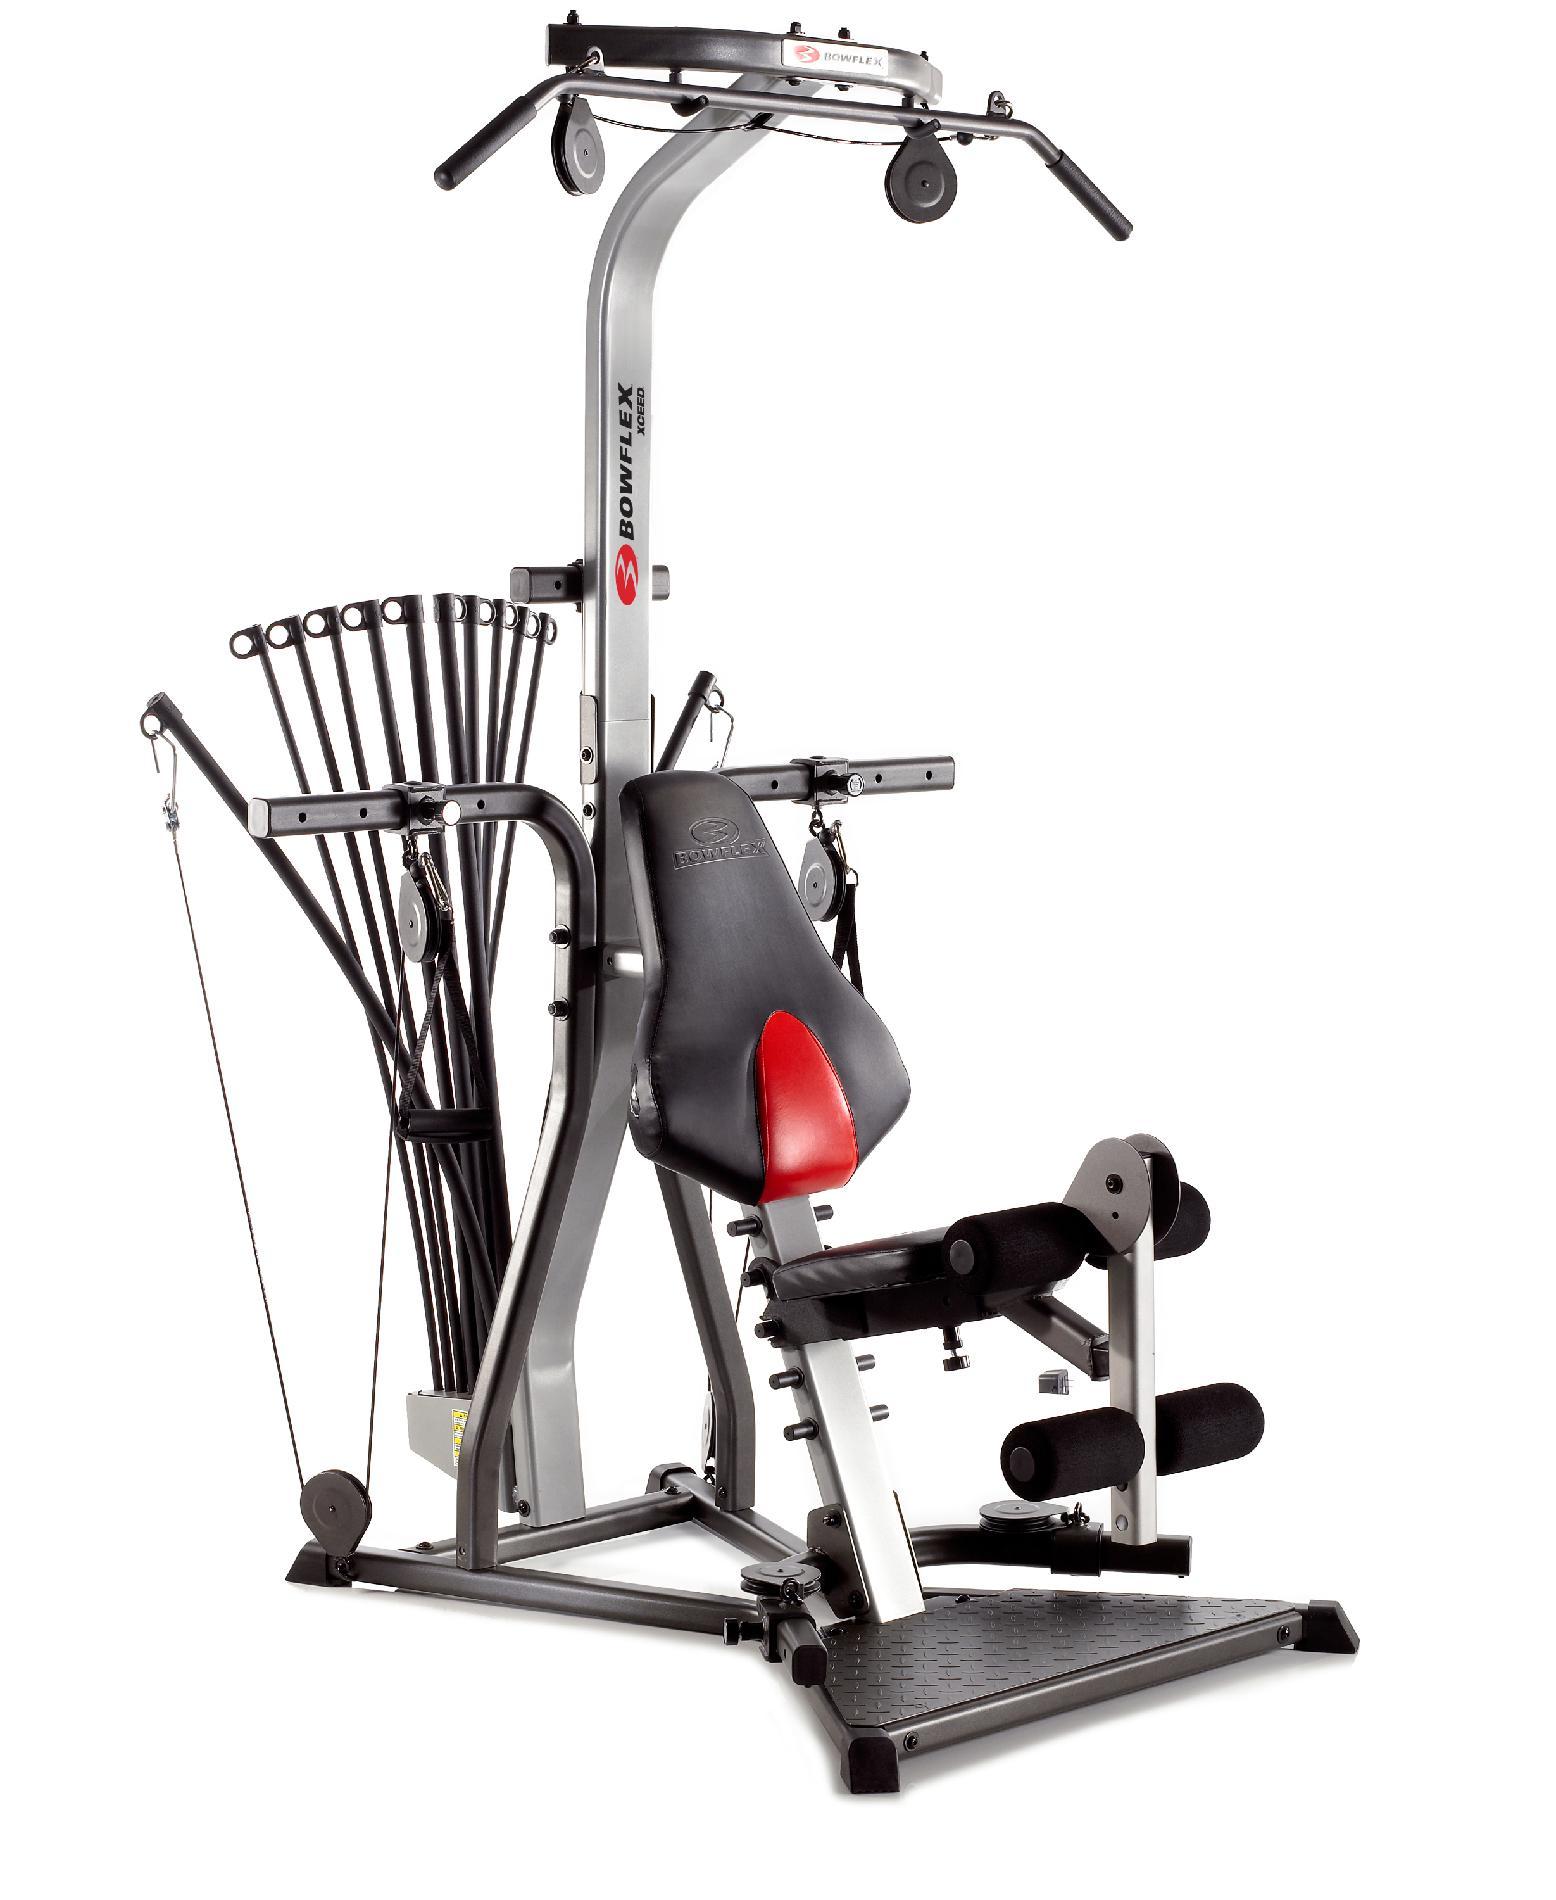 Bowflex Xceed Home Gym